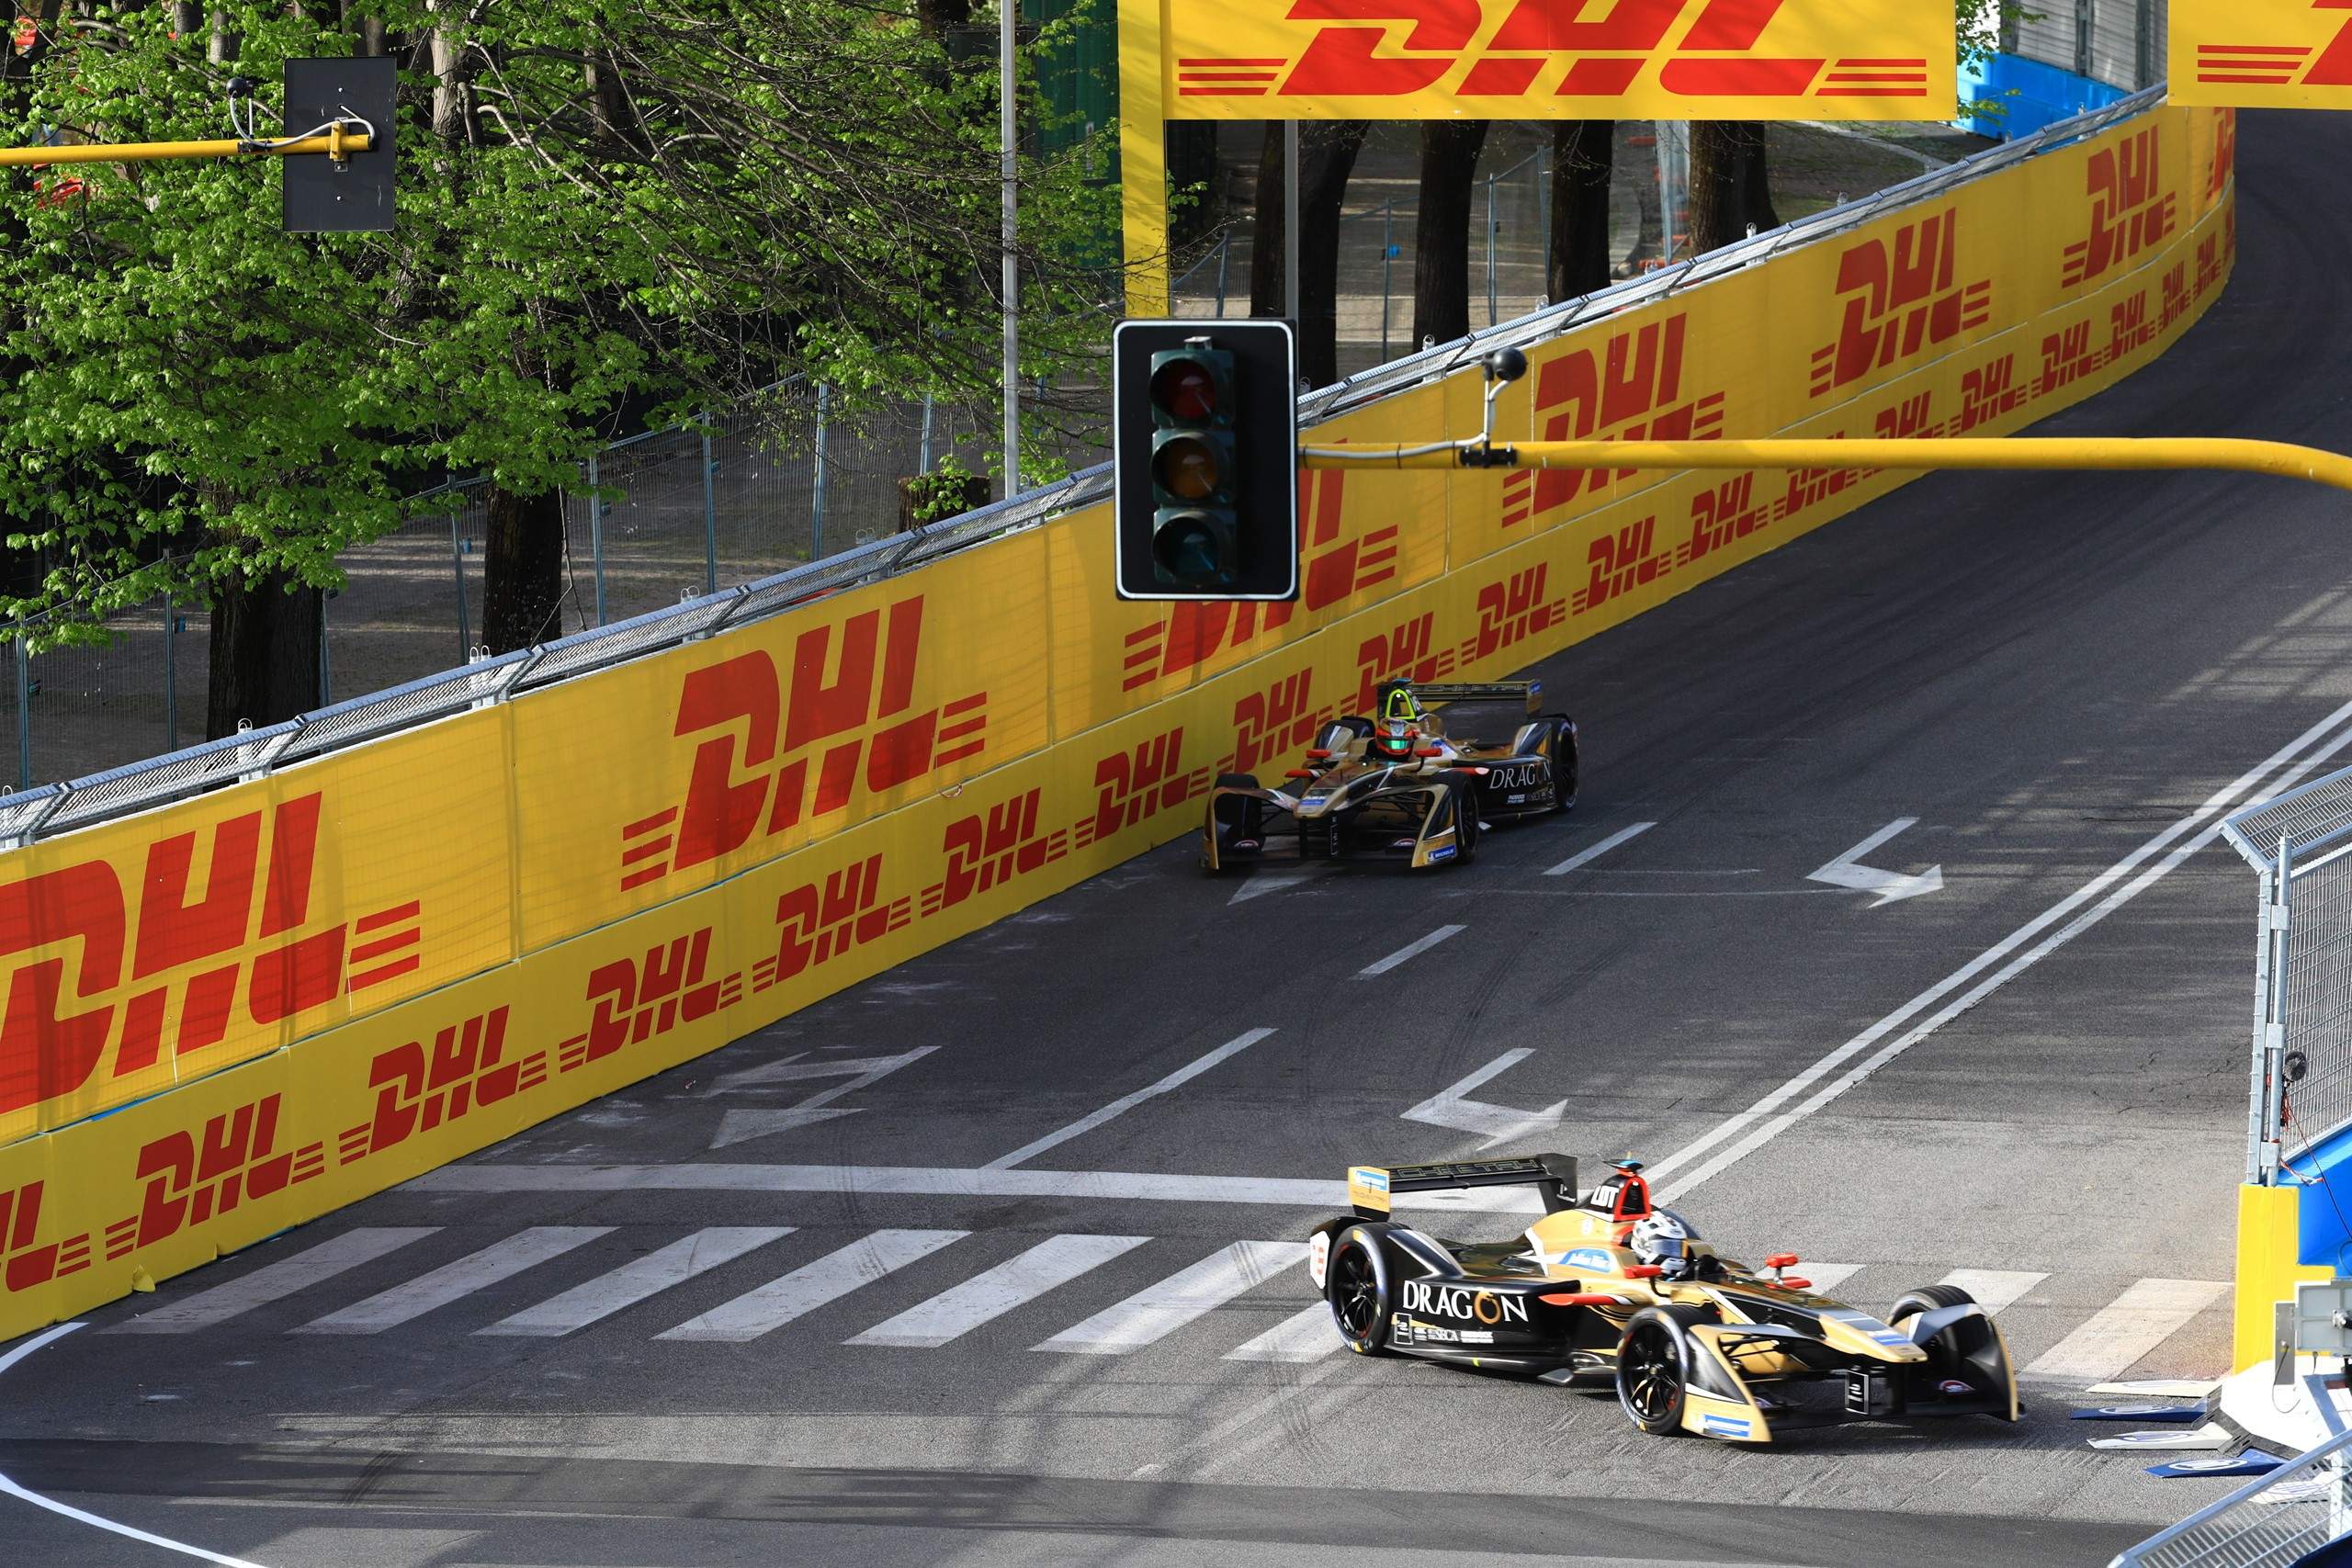 Andre Lotterer Jean Eric Vergne Techeetah Rome ePrix 2018 Formula E DHL